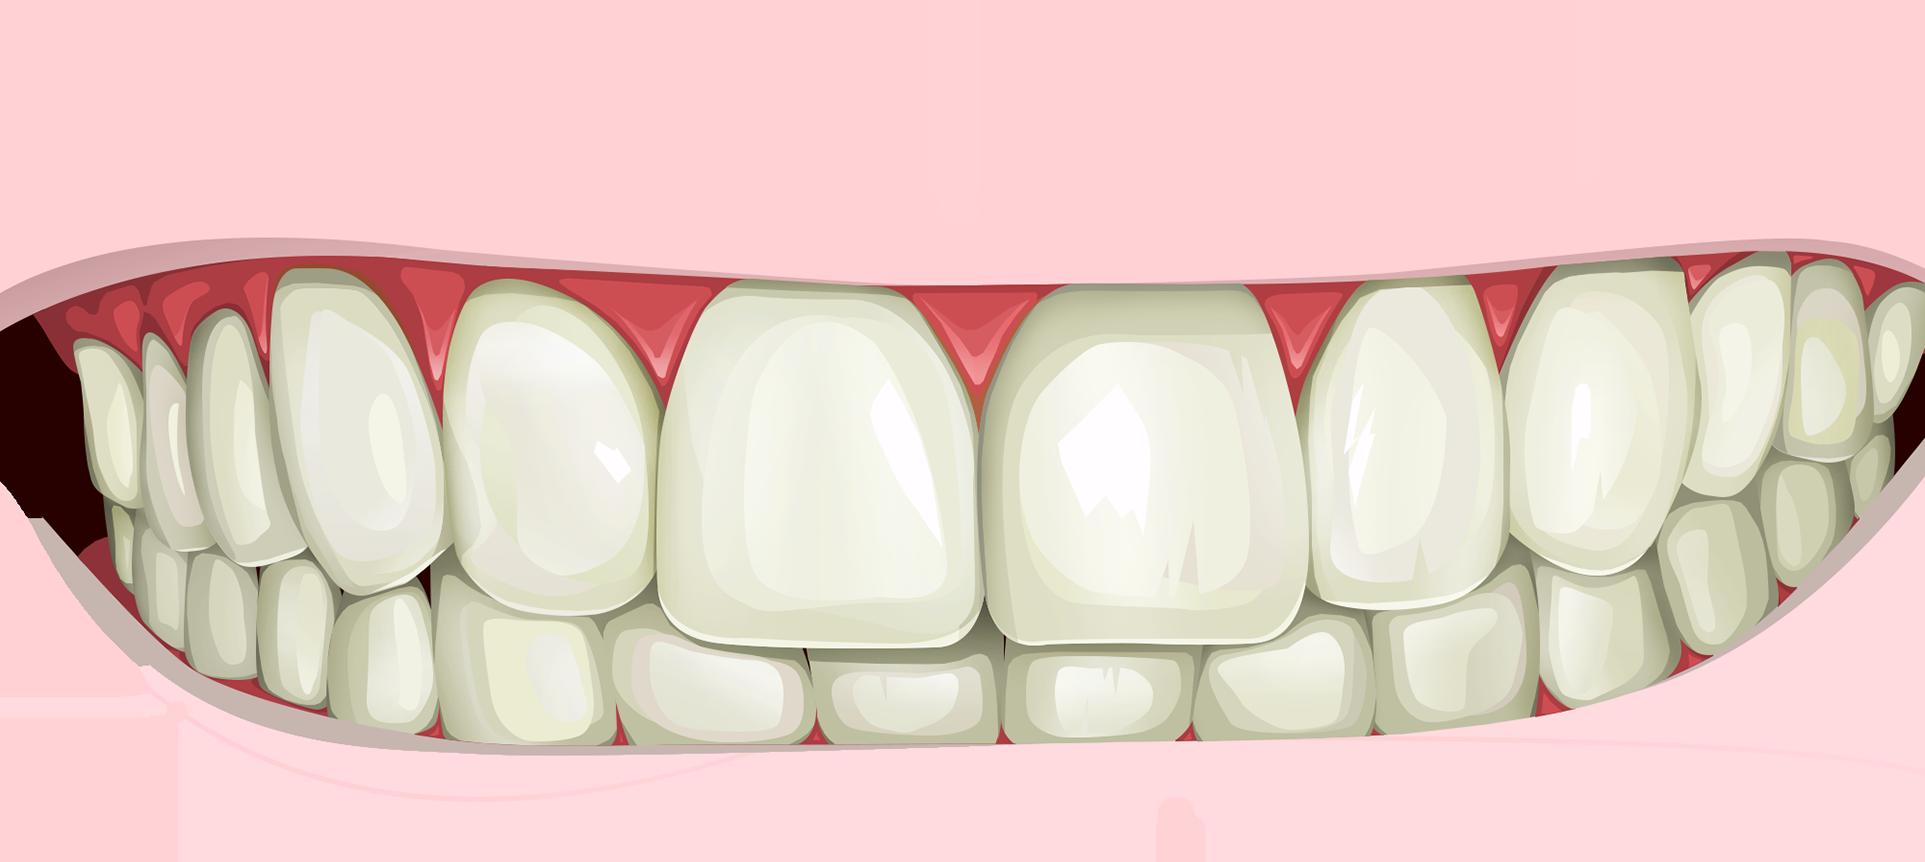 Цены на отбеливание зубов в брянске